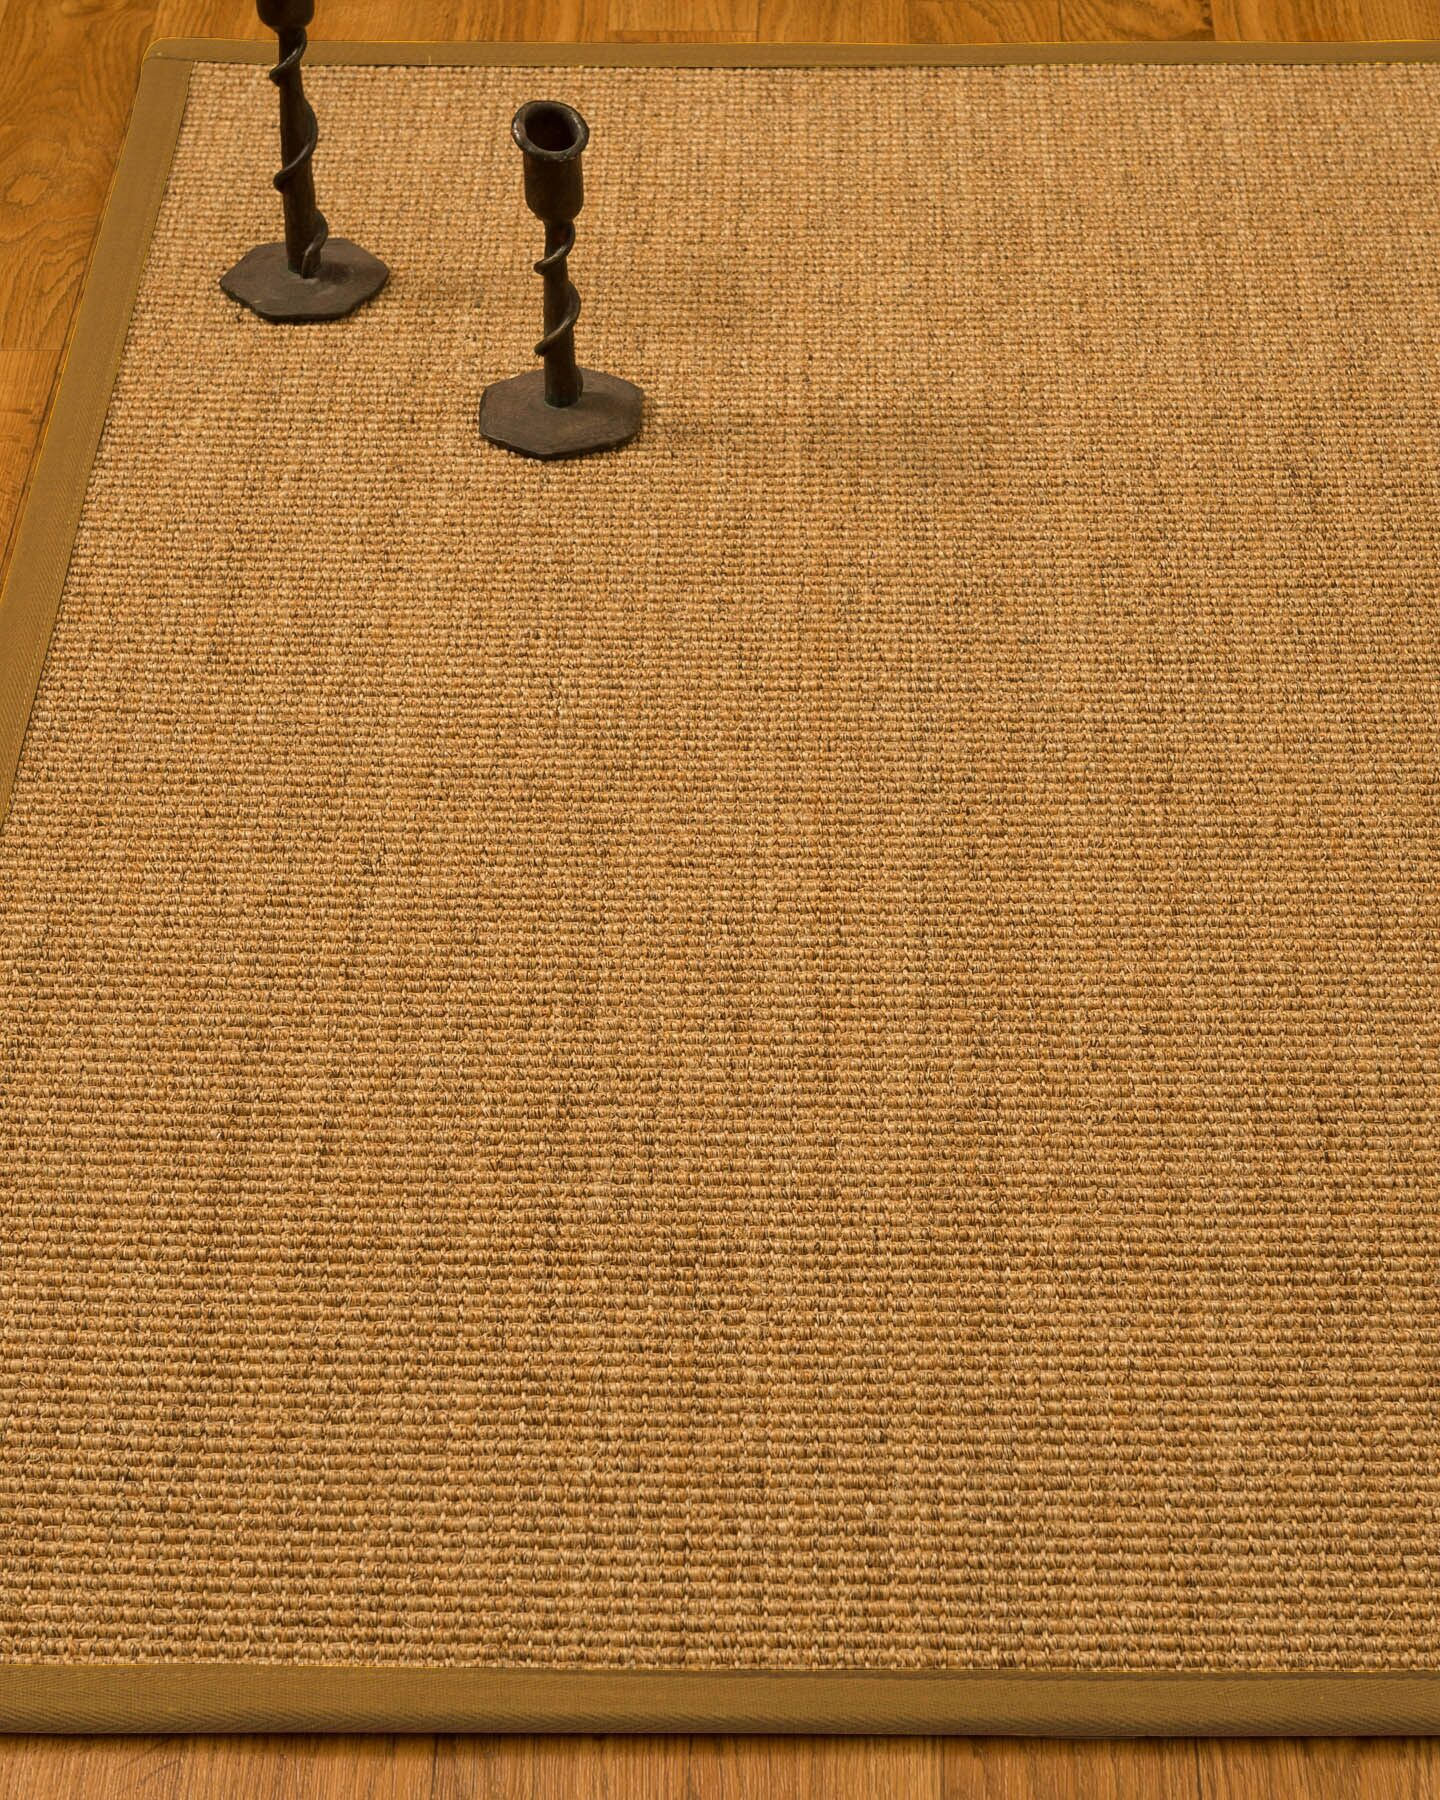 Escalante HandWoven Beige Area Rug Rug Size: Rectangle 4' x 6'